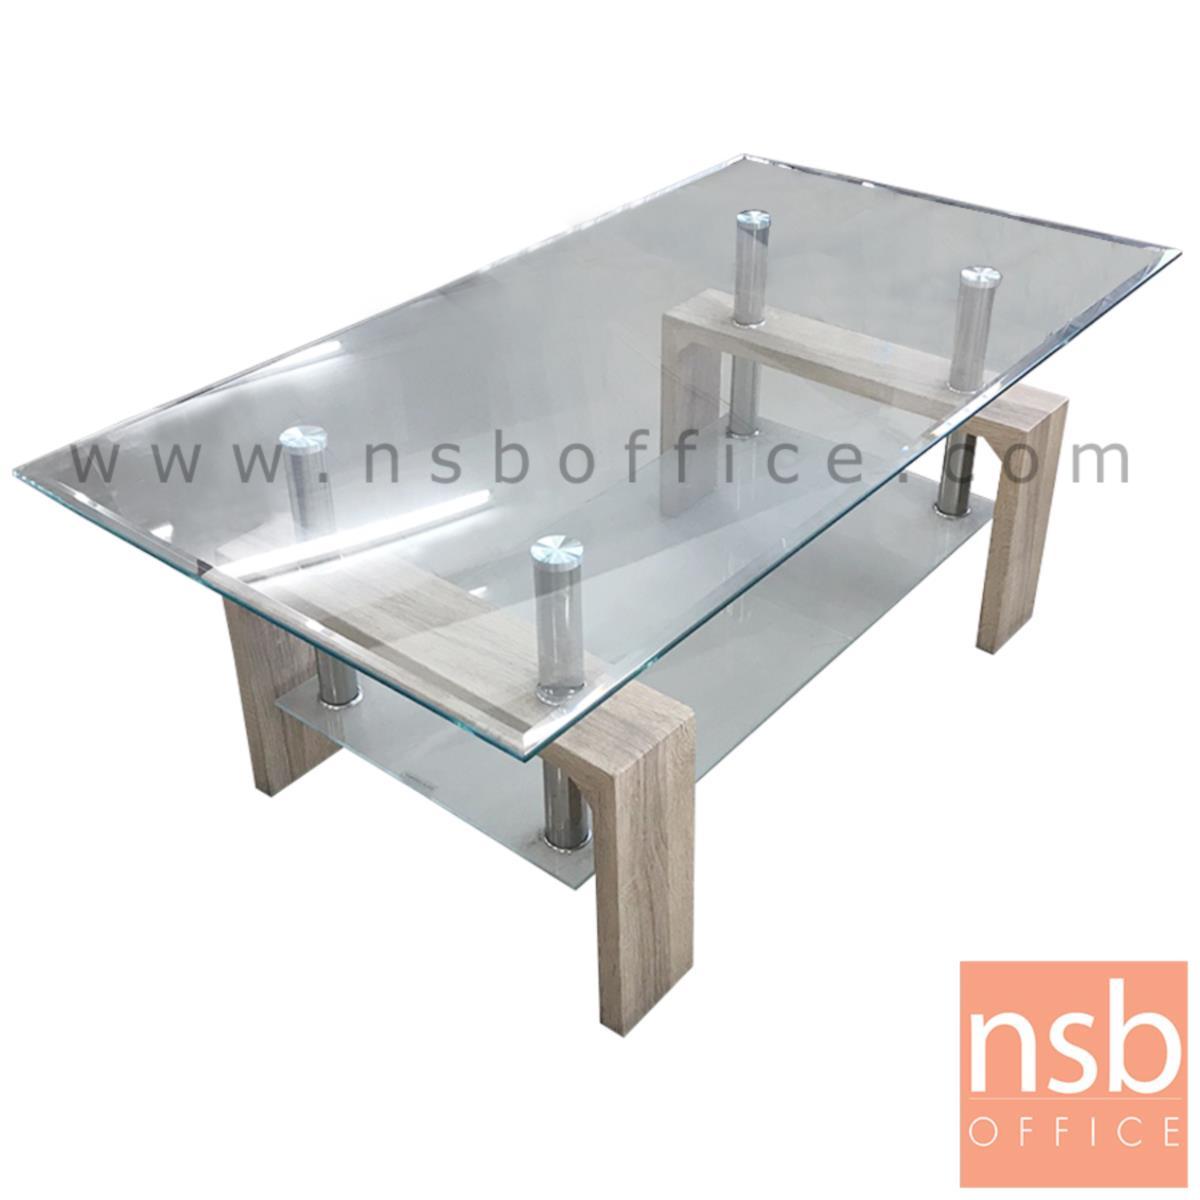 L10A164:โต๊ะกลางหน้ากระจก  ขนาด 110W*45H cm.  ขาไม้